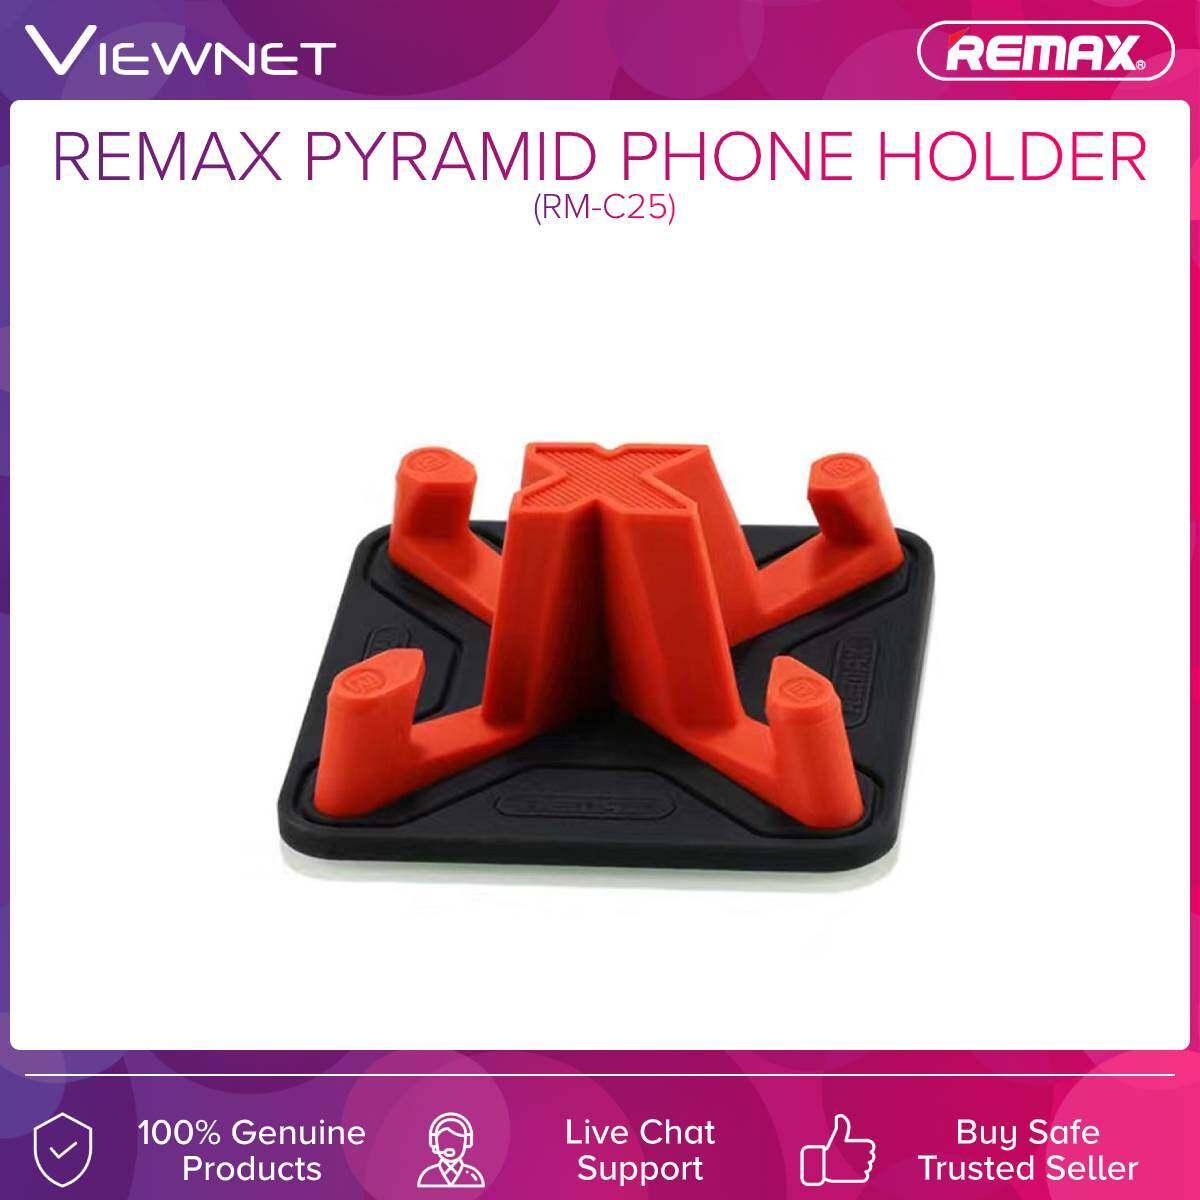 Remax (RM-C25) Pyramid Phone Holder